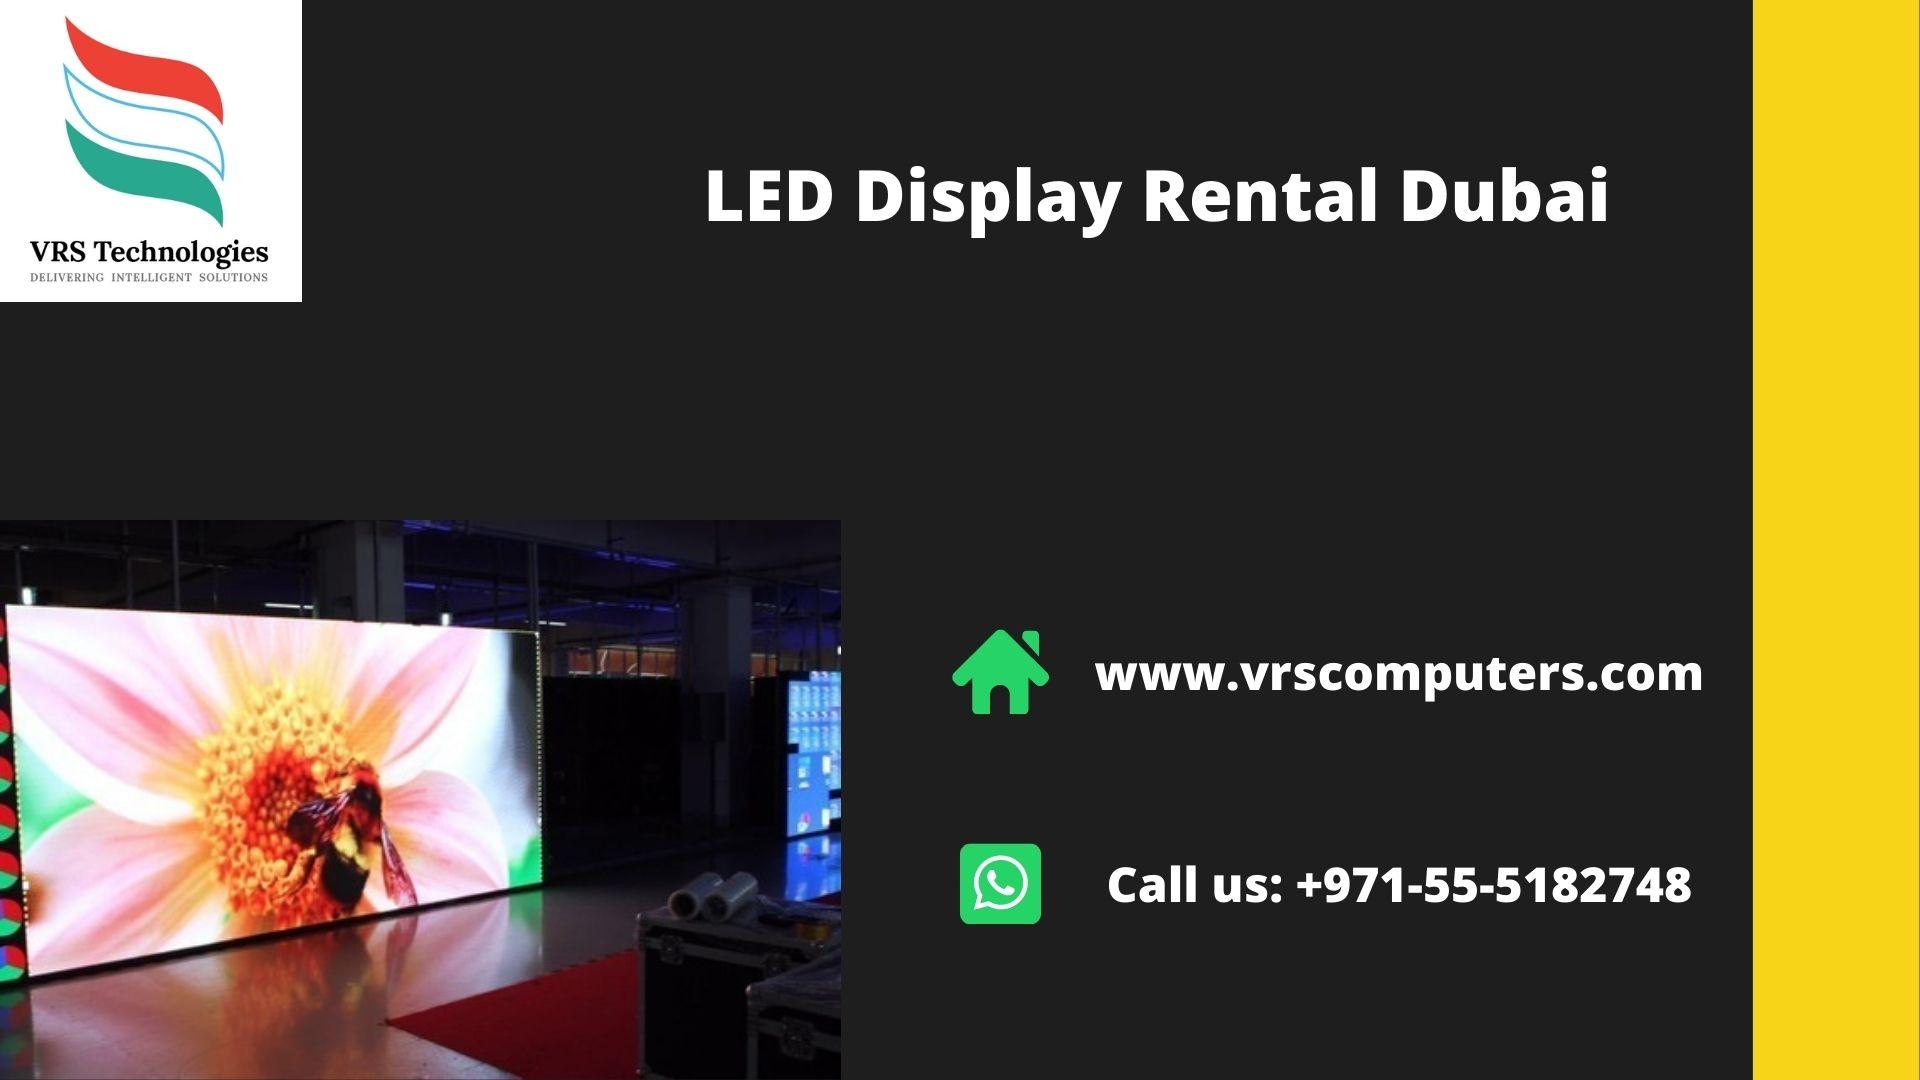 LED-Display-Rental-Dubai.jpg